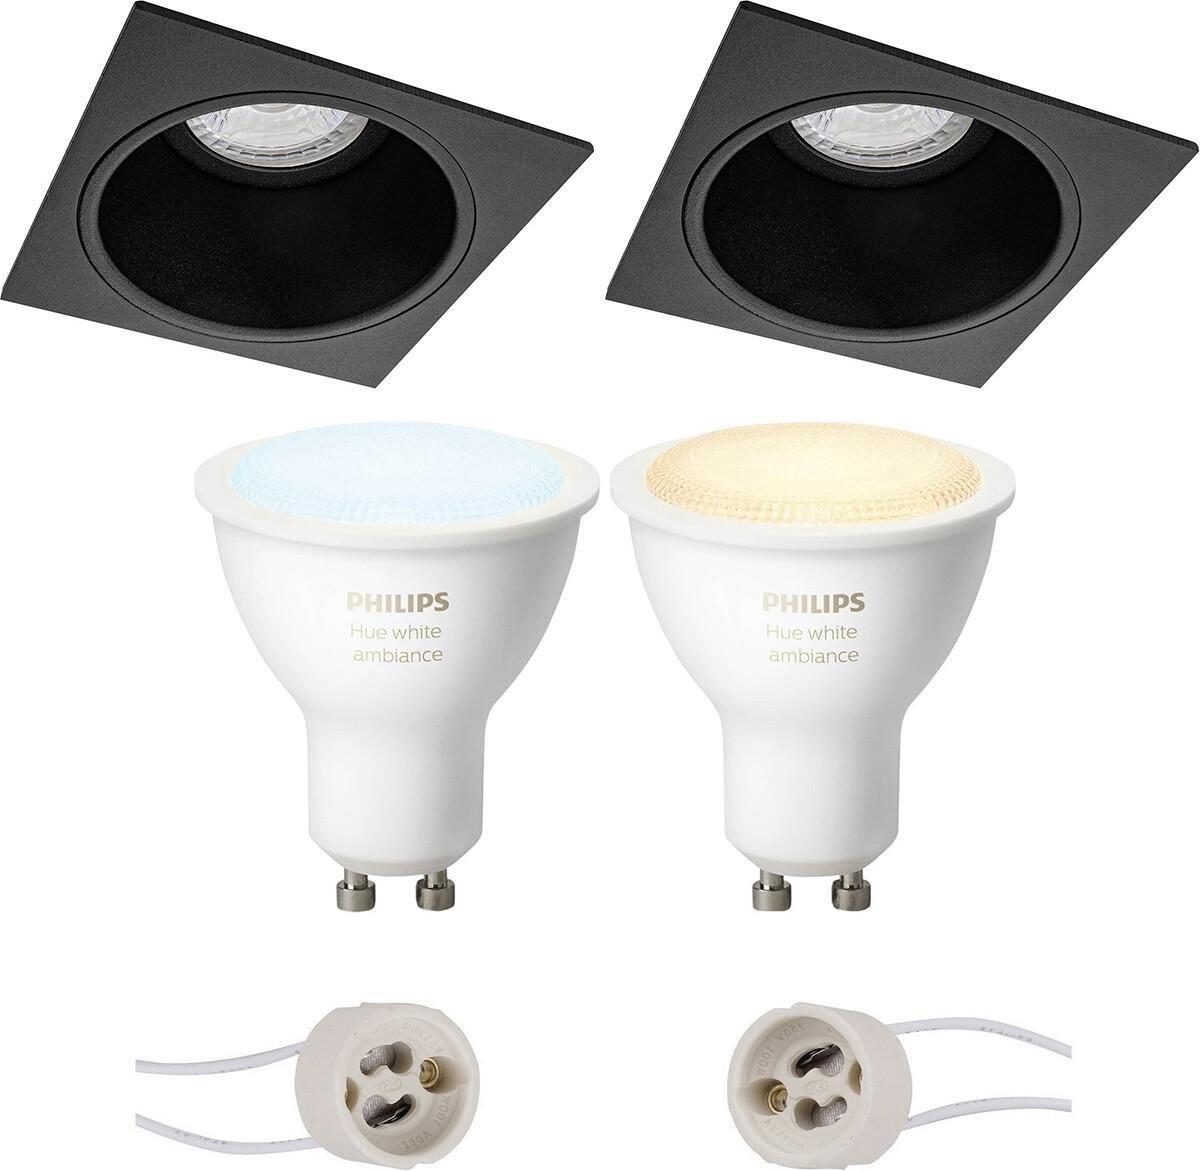 PHILIPS HUE - LED Spot Set GU10 - White Ambiance - Bluetooth - Proma Minko Pro - Inbouw Vierkant - Mat Zwart - Verdiept - 90mm